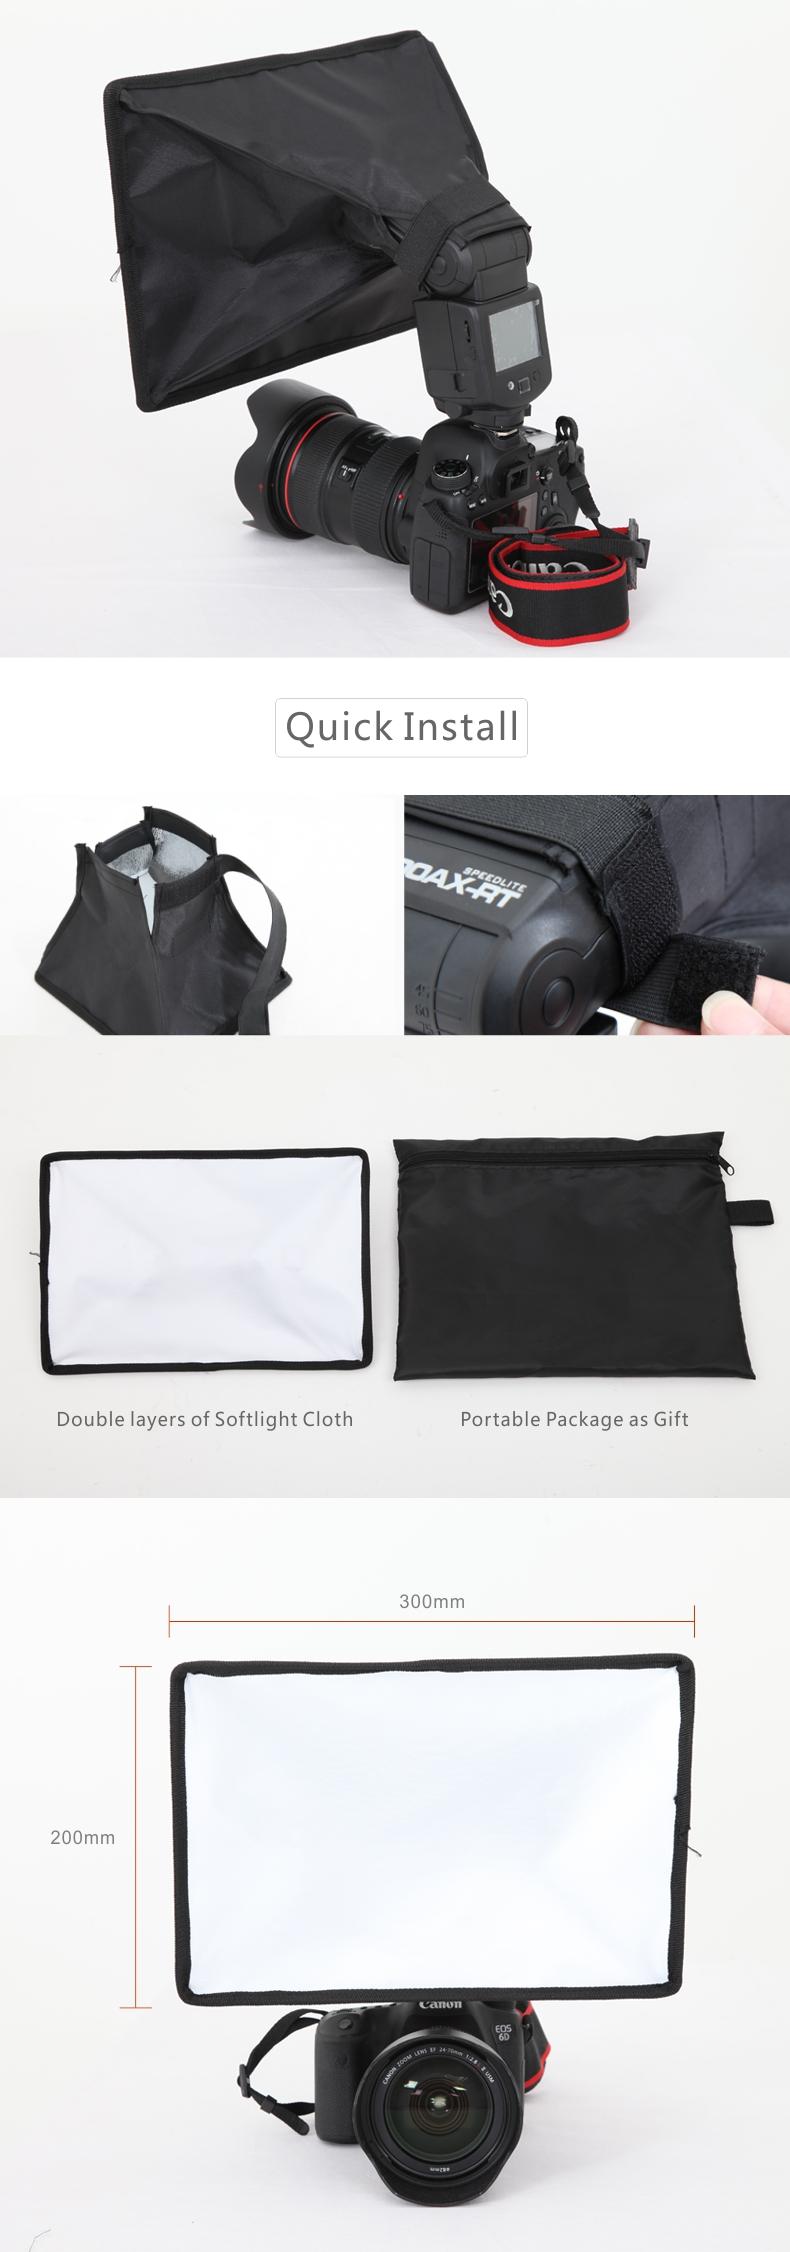 Falconeyes ESB2030 Portable Foldable Flash Diffuser Softbox for Canon Nikon  Sony DSLR flash Speedlite Photo Studio Accessories